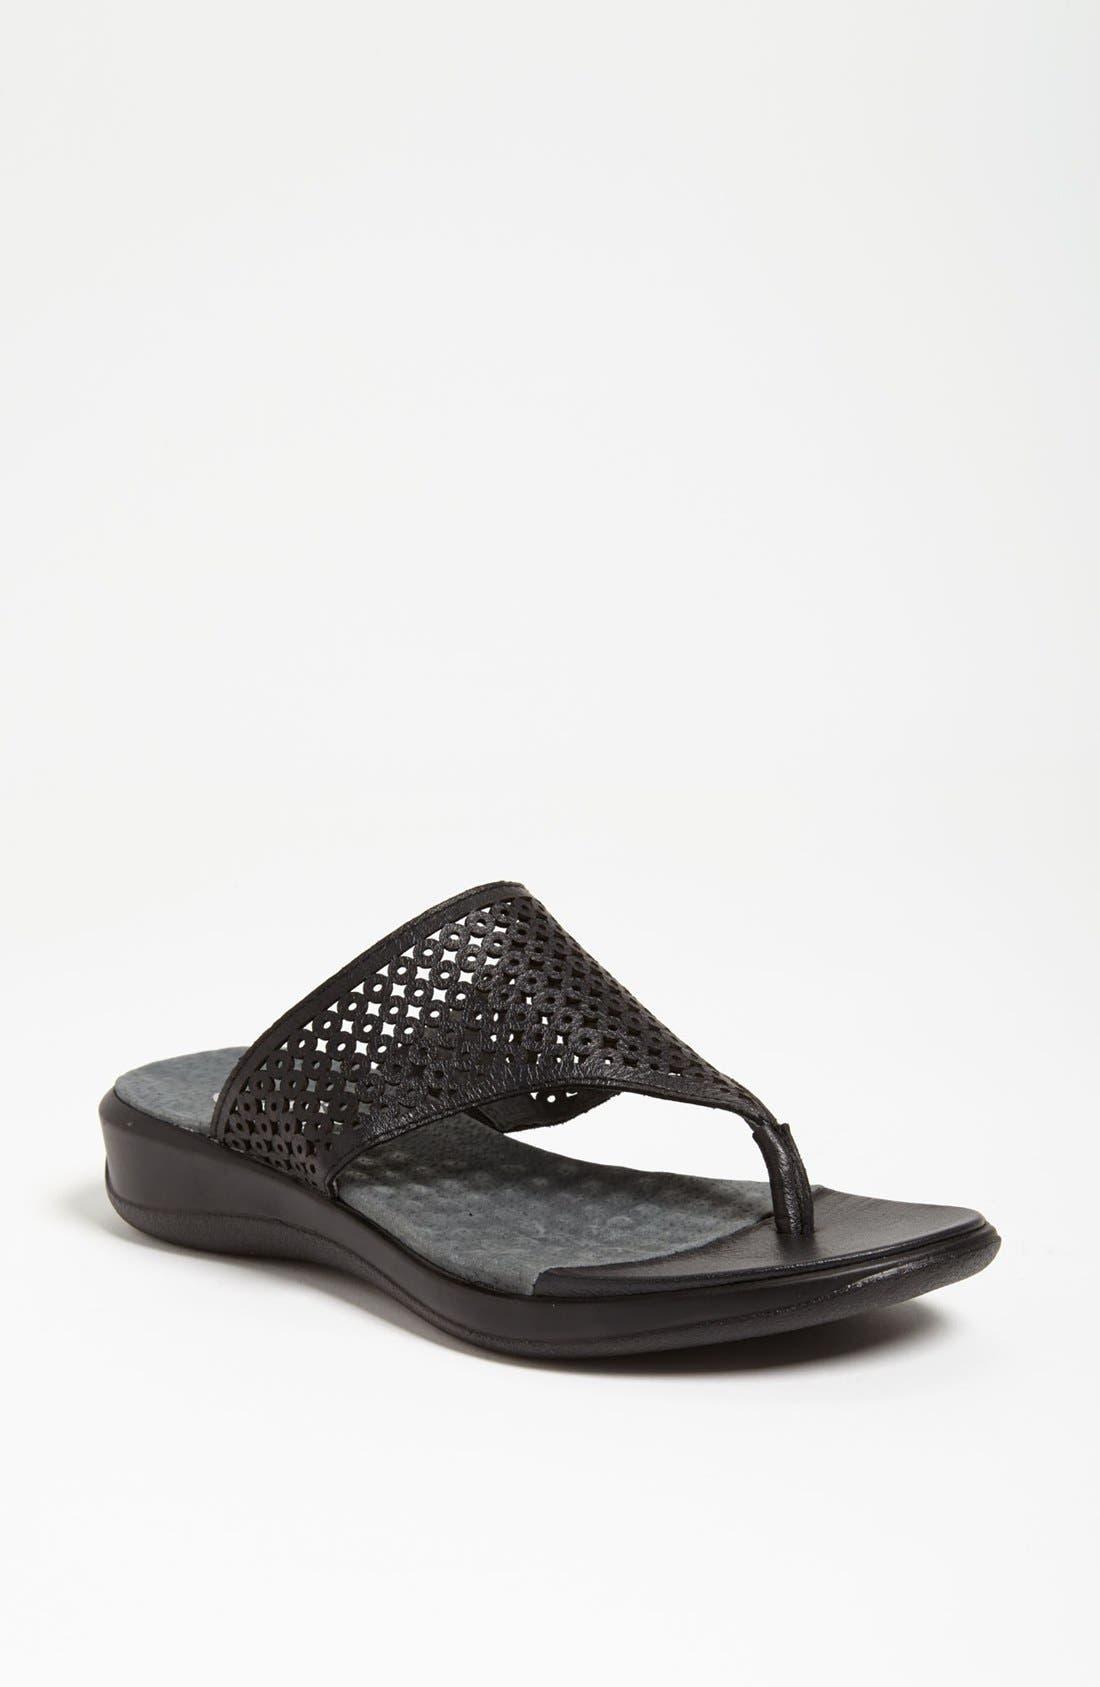 Alternate Image 1 Selected - SoftWalk® 'Tallahassee' Sandal